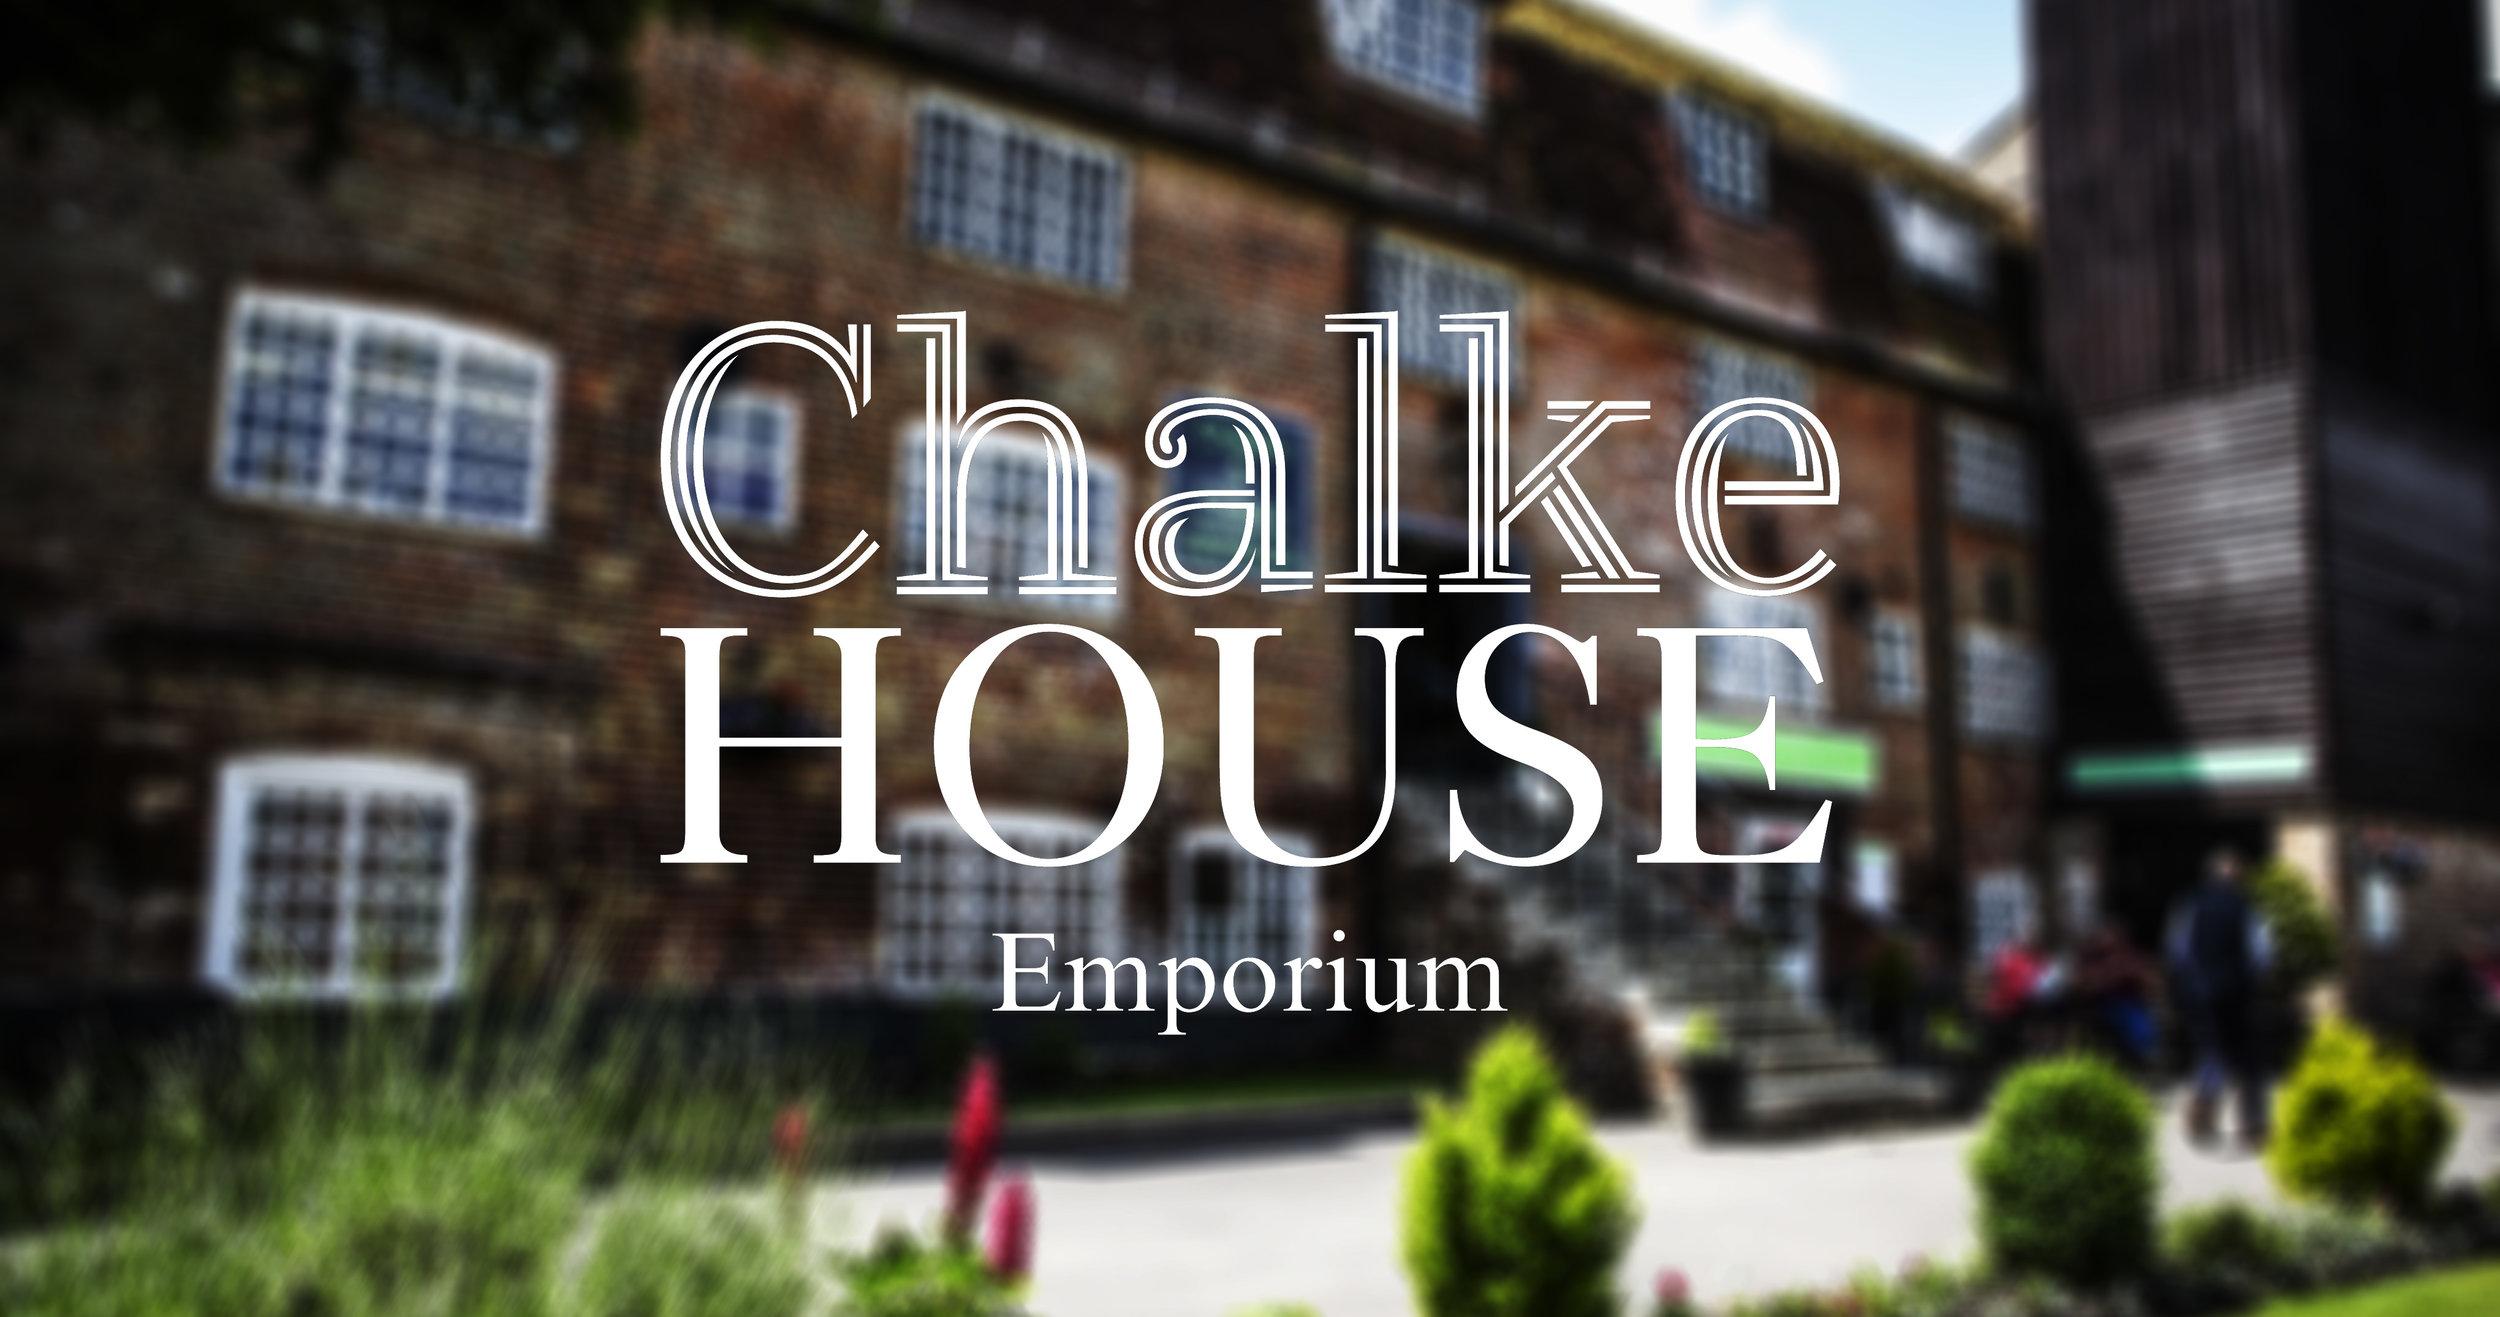 Chalke House Emporium